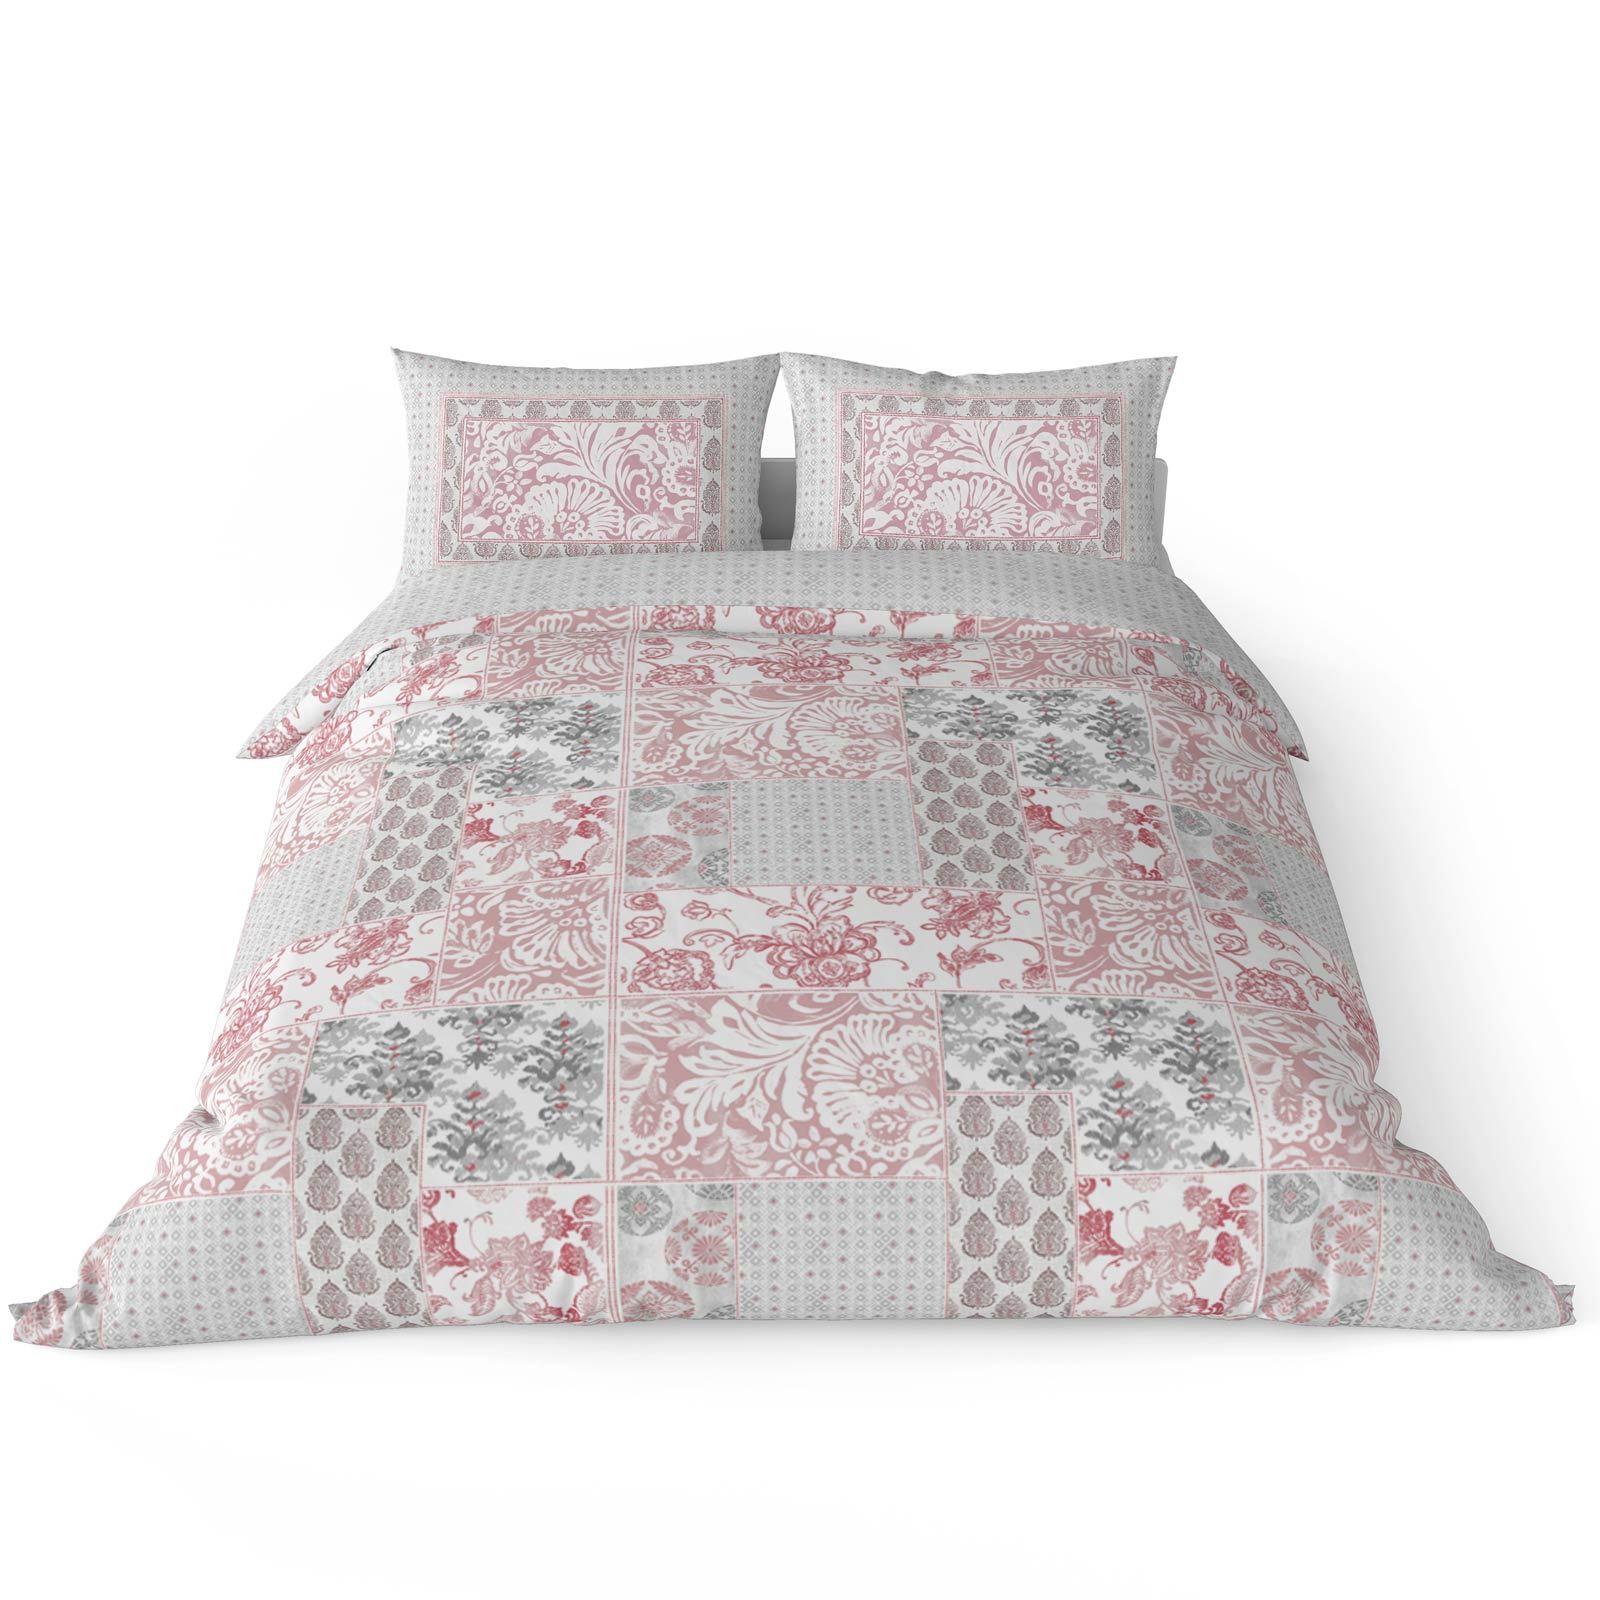 Cubierta-Edredon-Rosa-Blush-Rose-Impreso-juego-De-Edredon-Conjuntos-de-Cama-cubre-Jacquard miniatura 46